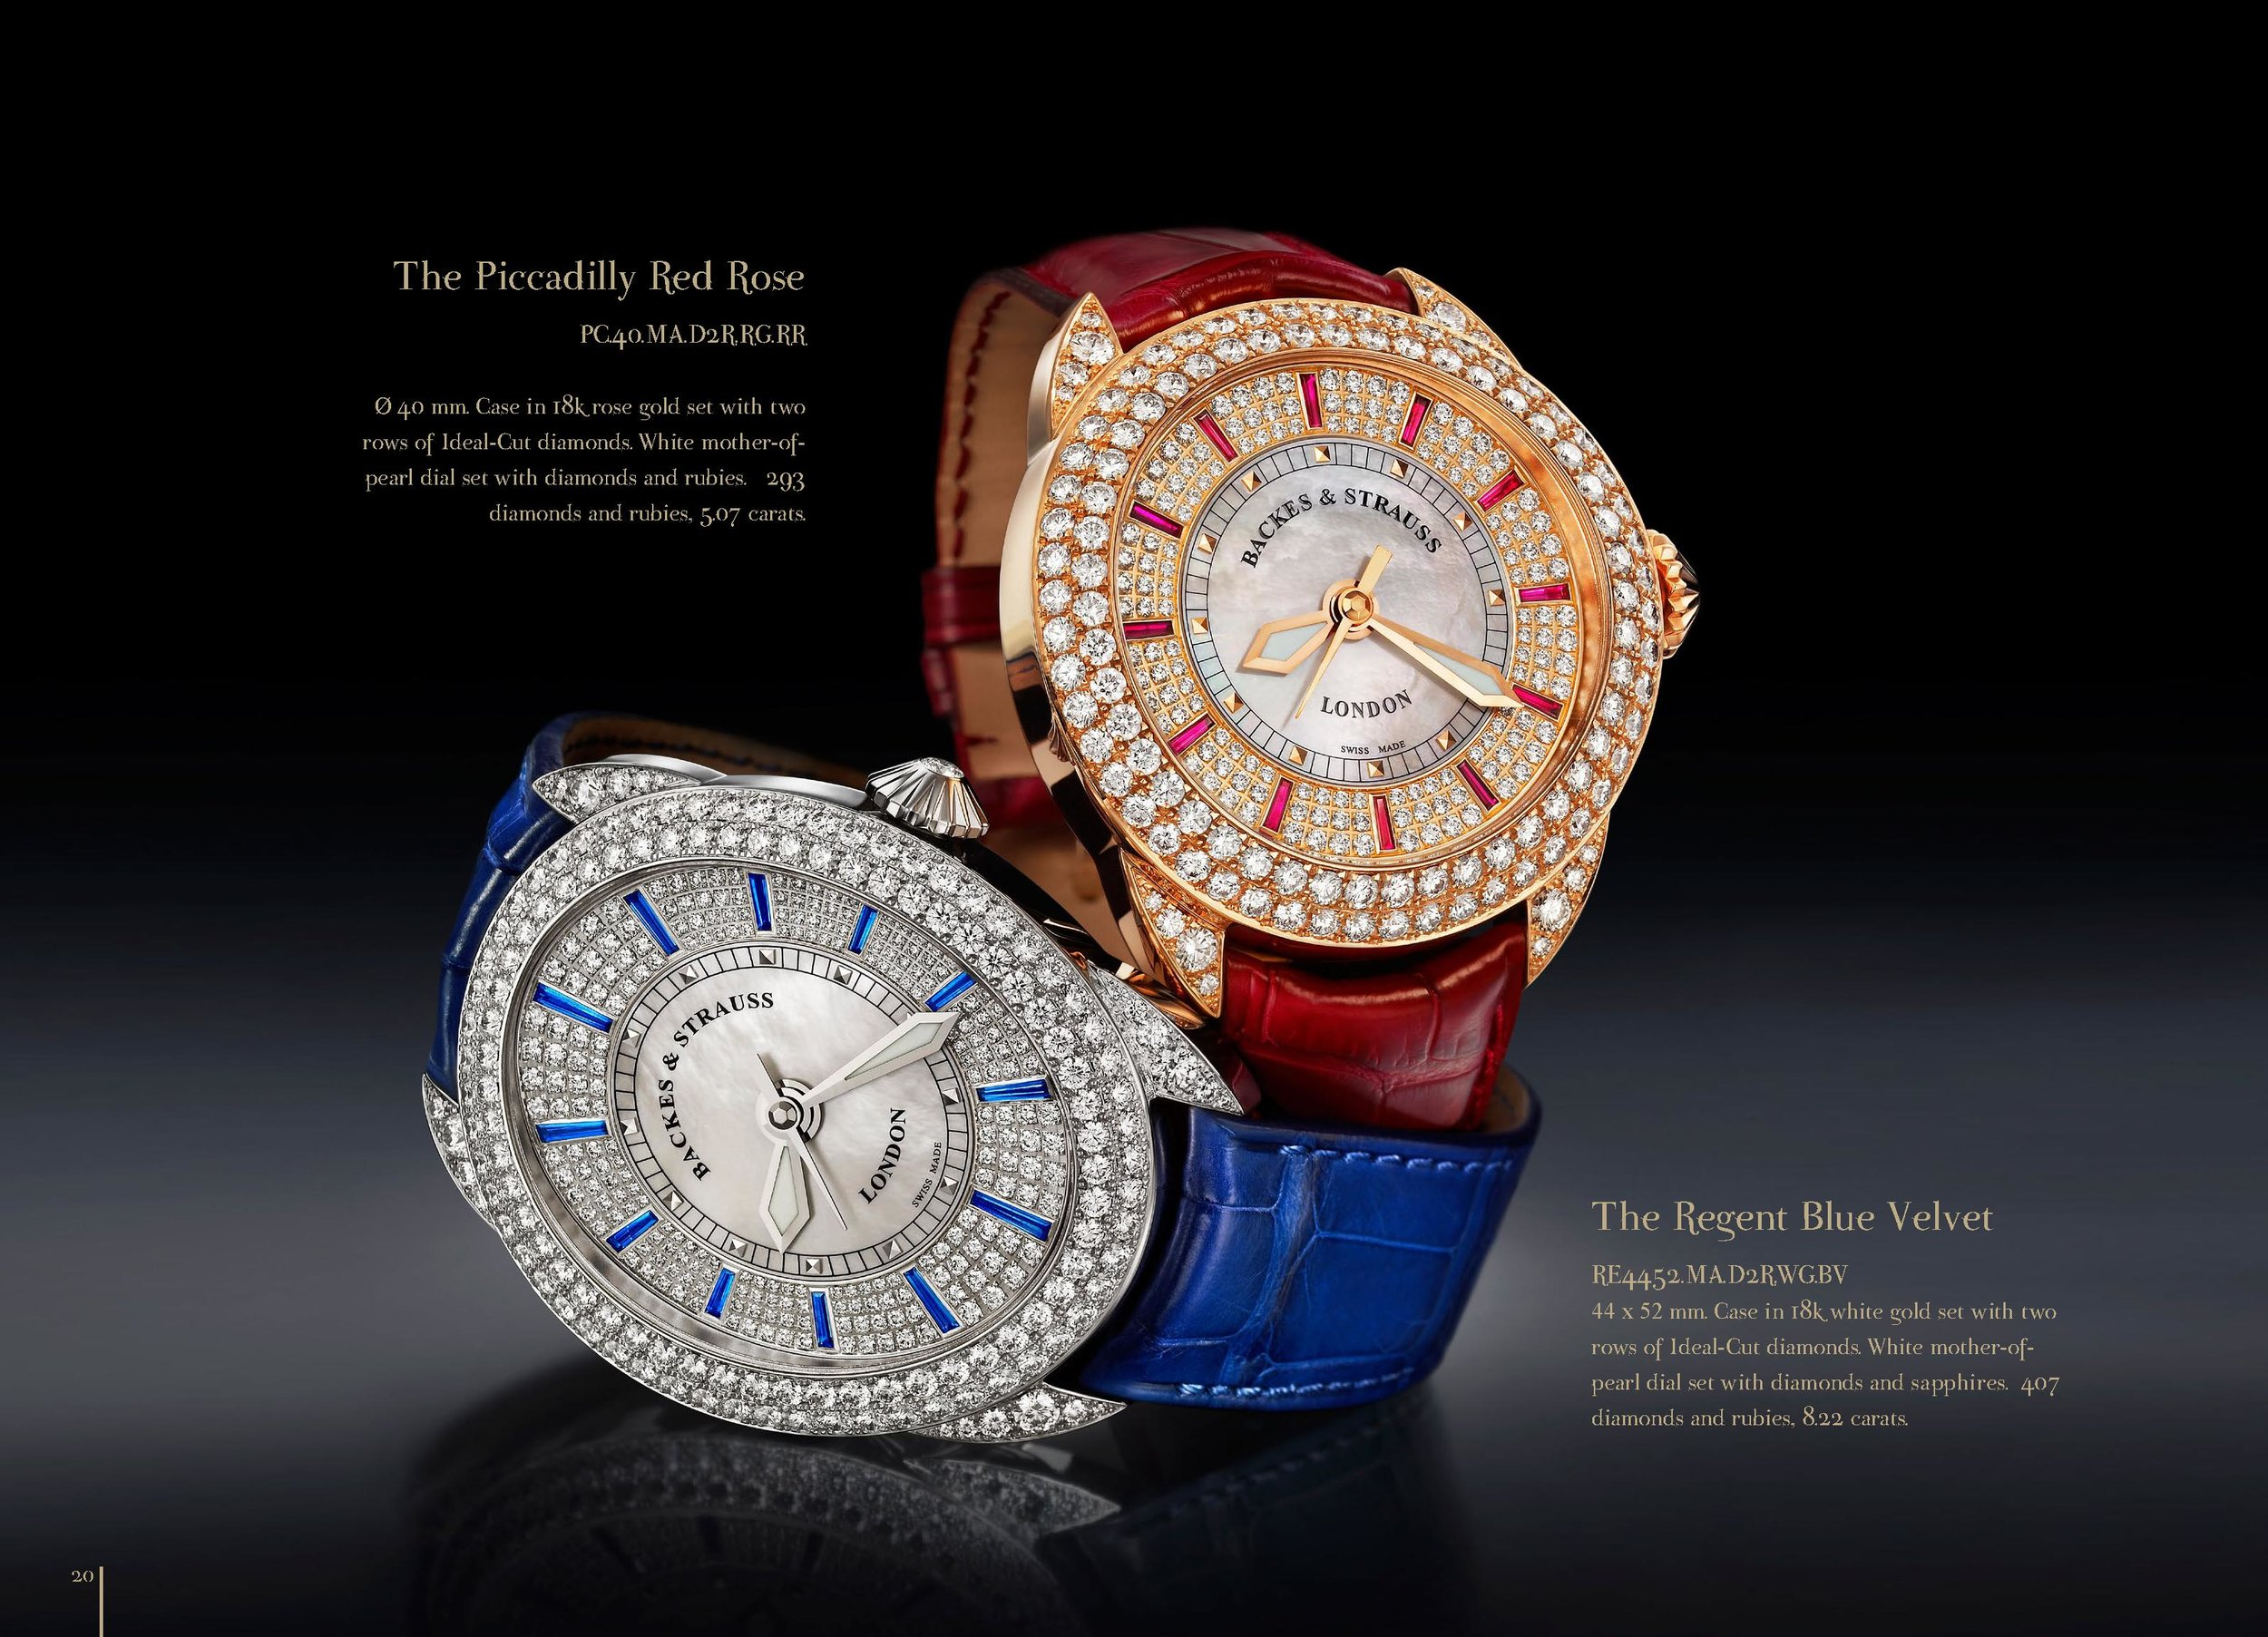 Piccadilly Red Rose & Regent Blue Velvet watch